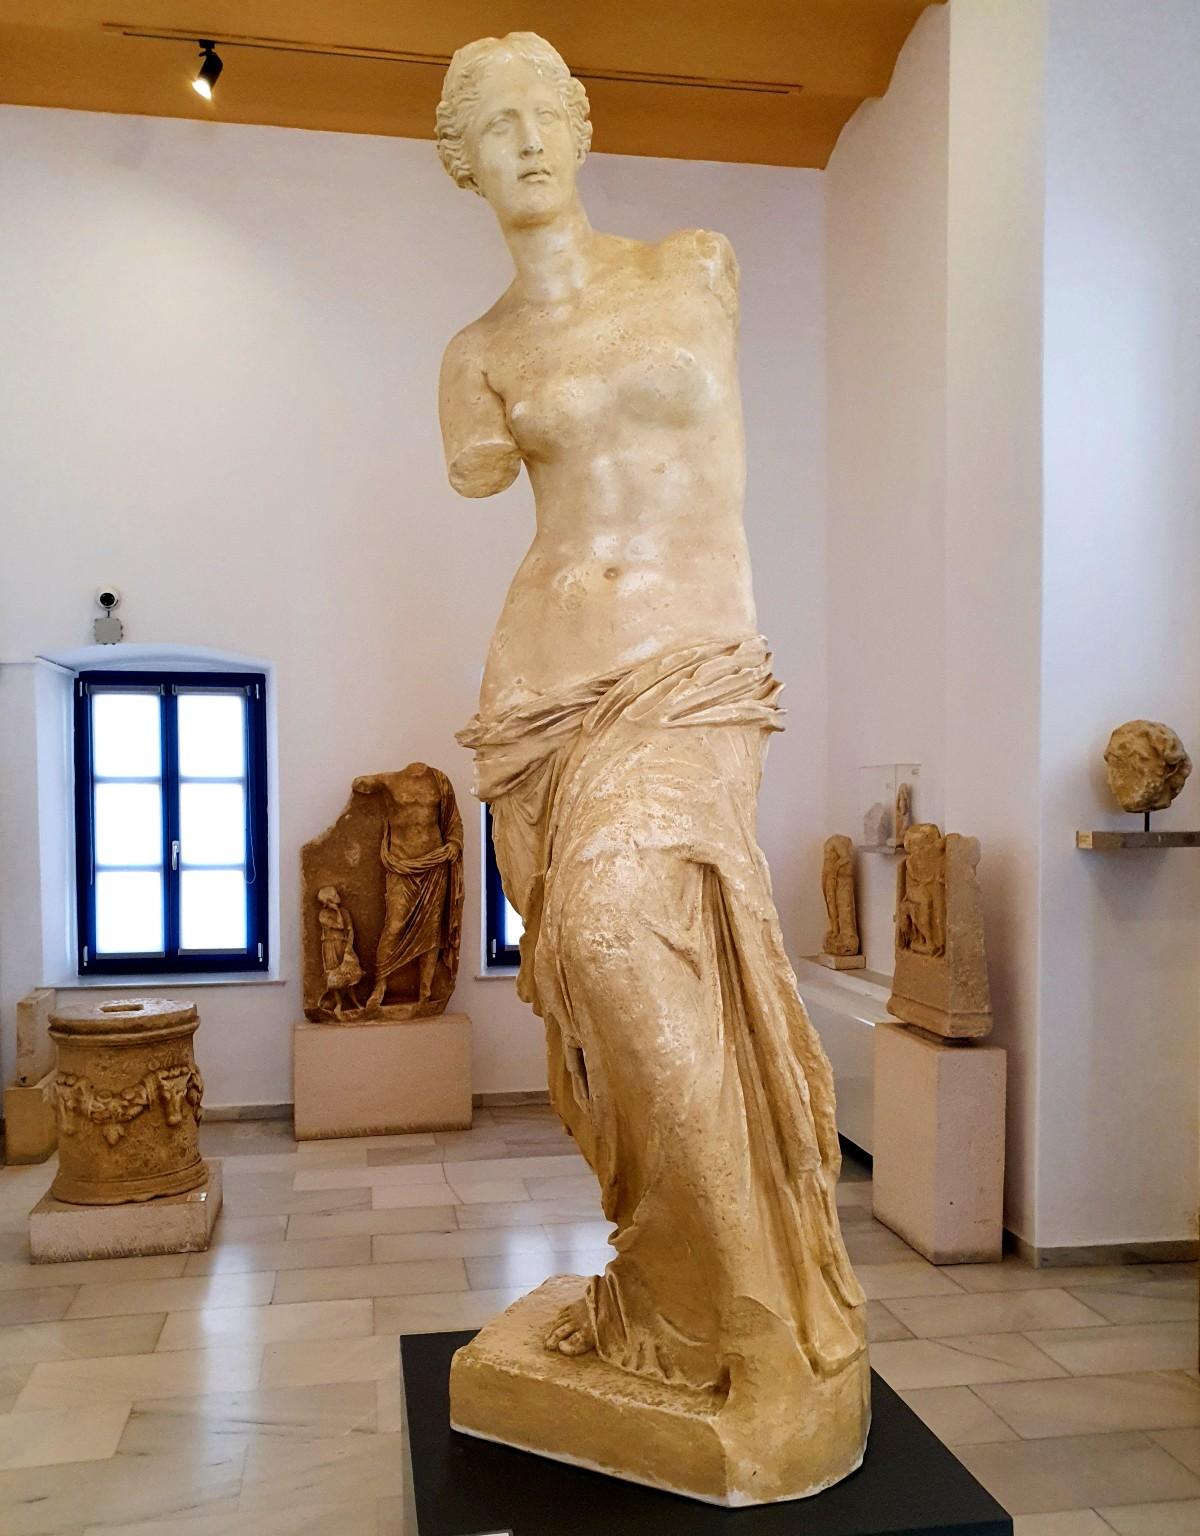 Venus of Milos in the Archaeological Museum of Milos